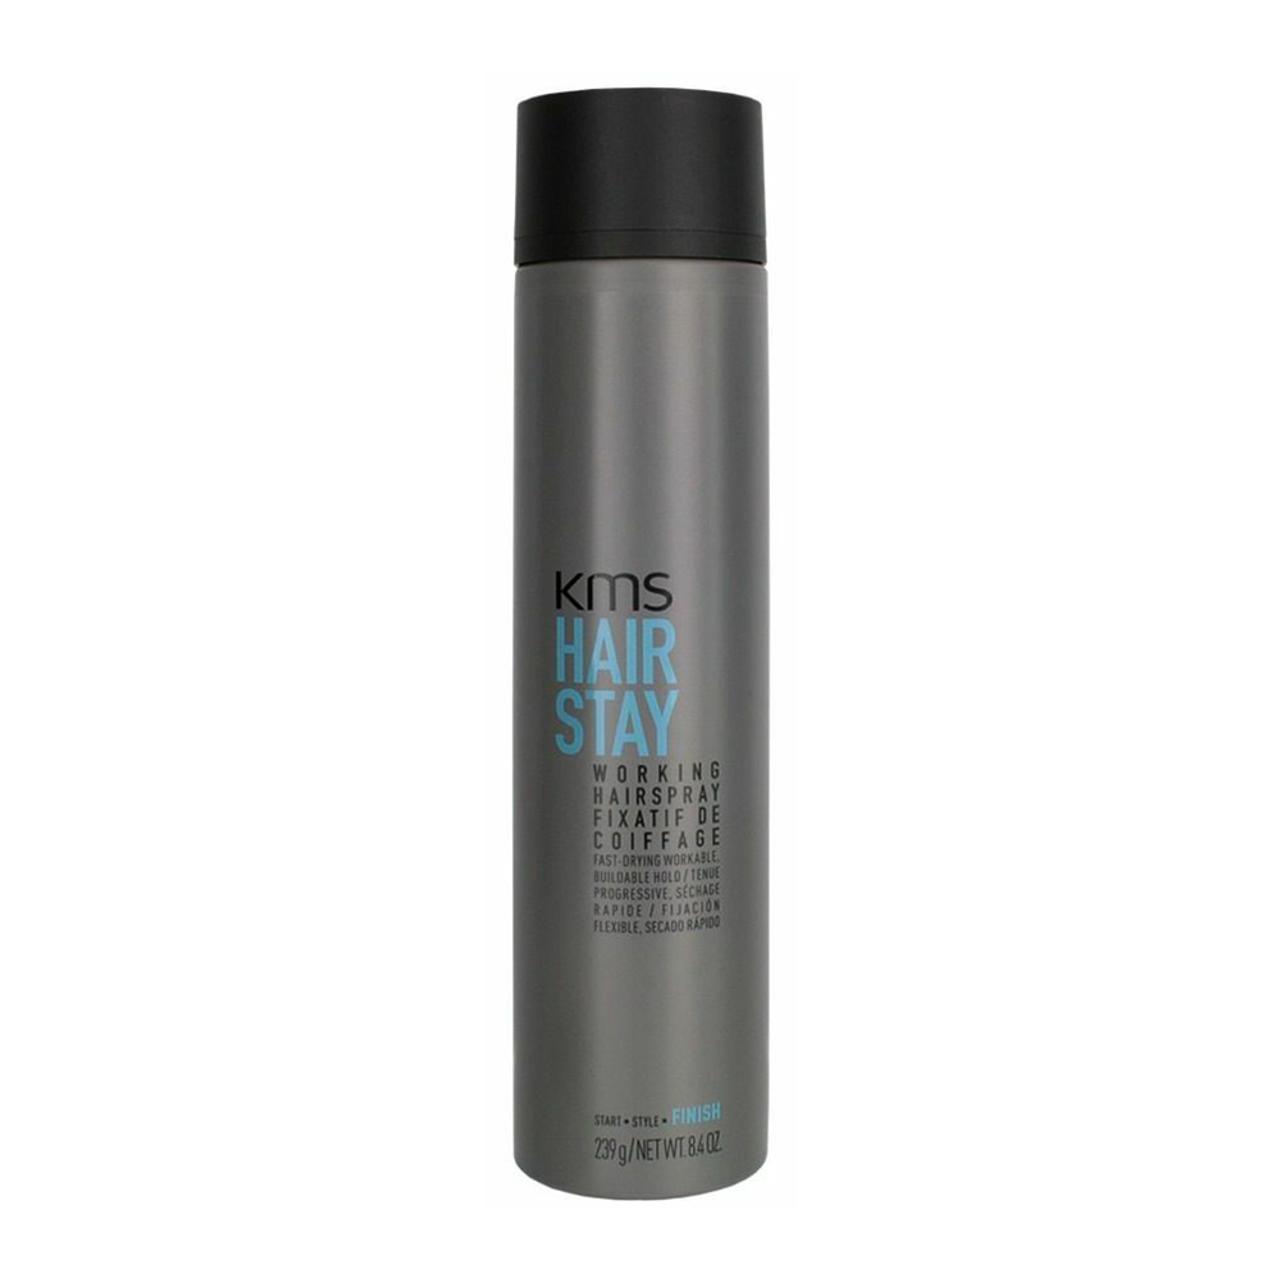 KMS Hair Stay Working Hairspray Finish 8.4 Oz